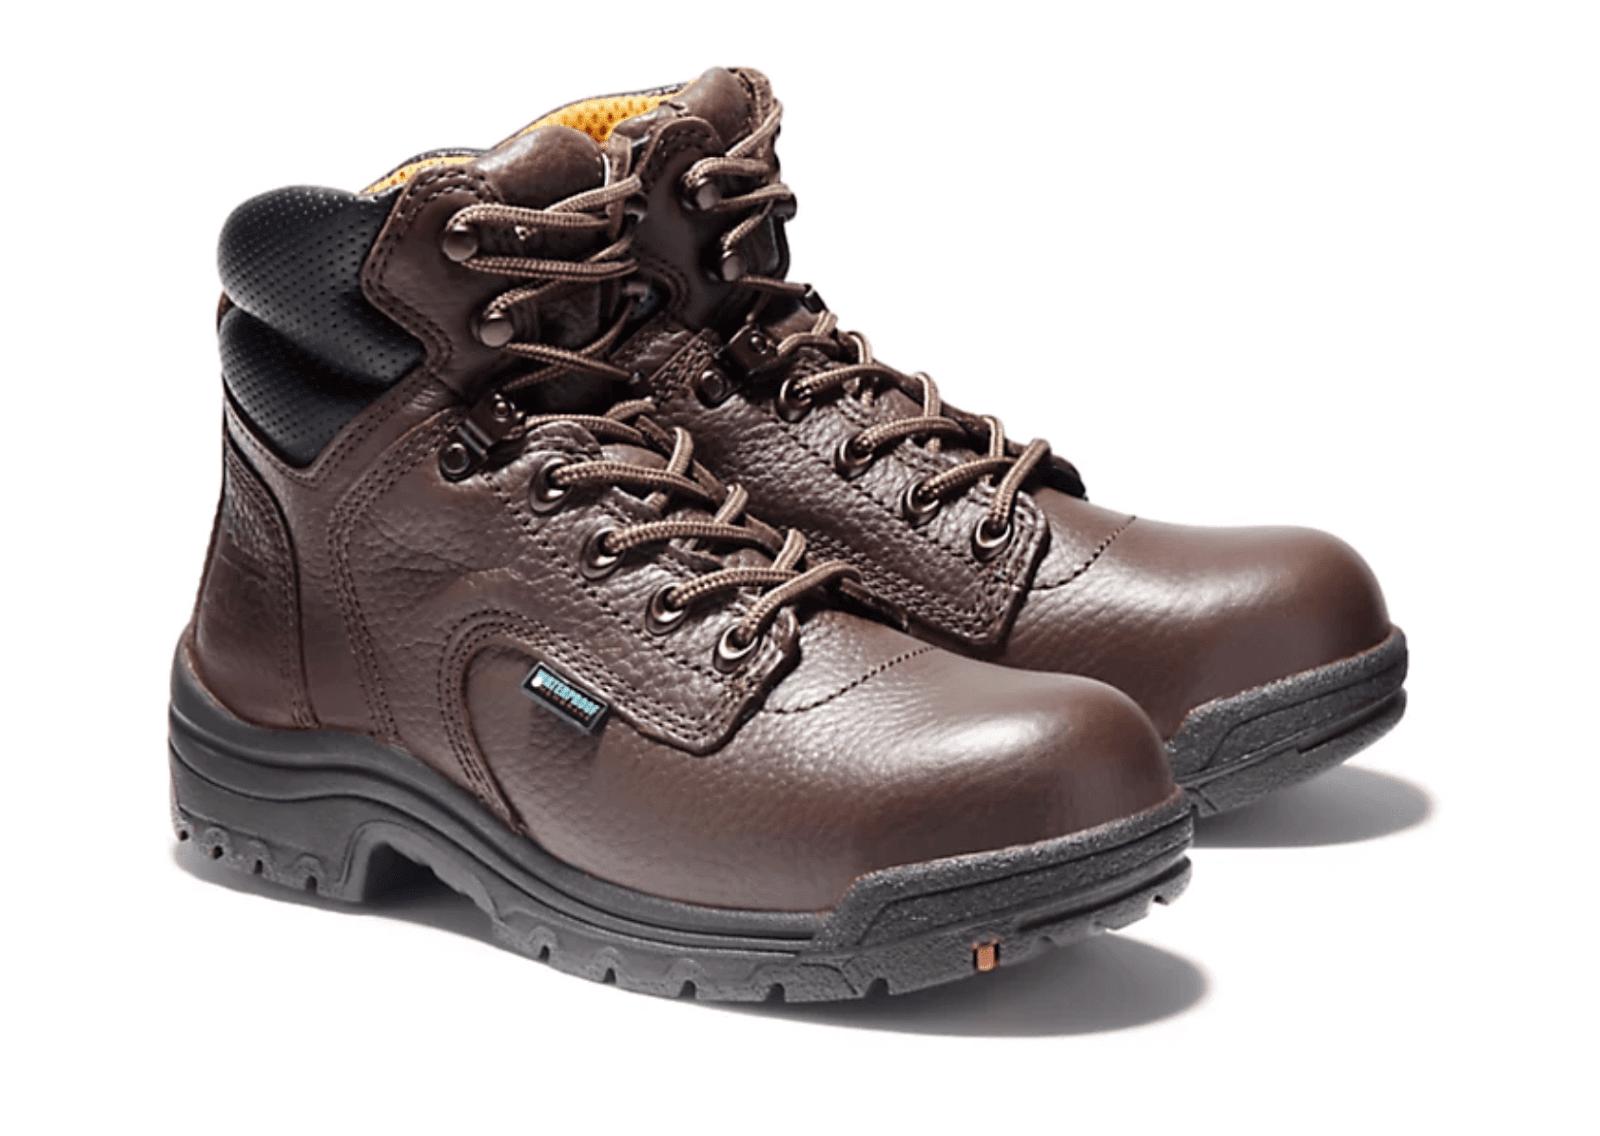 Timberland PRO Titan 6� Alloy Toe Work Boots